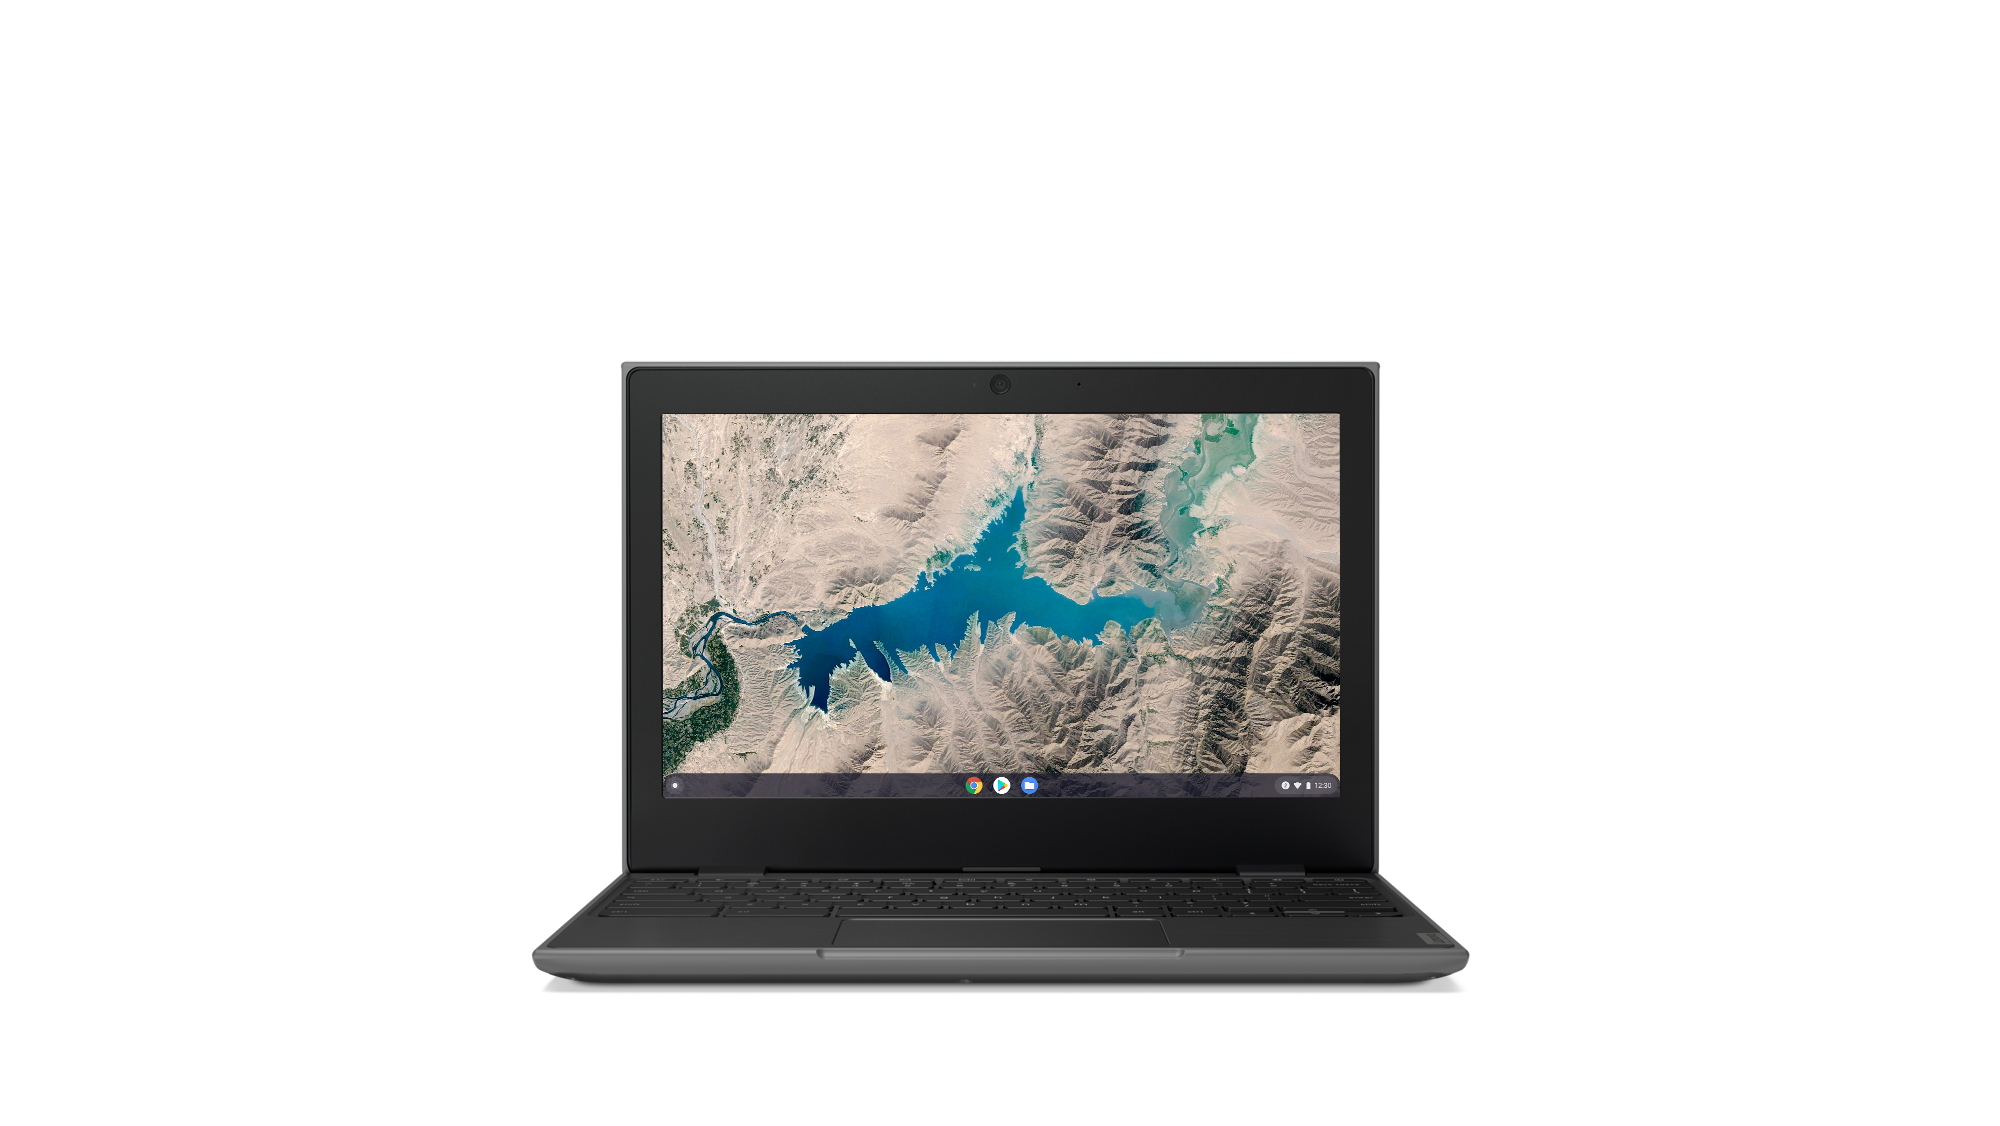 Lenovo 100e Chromebook 2nd Gen - photo 1